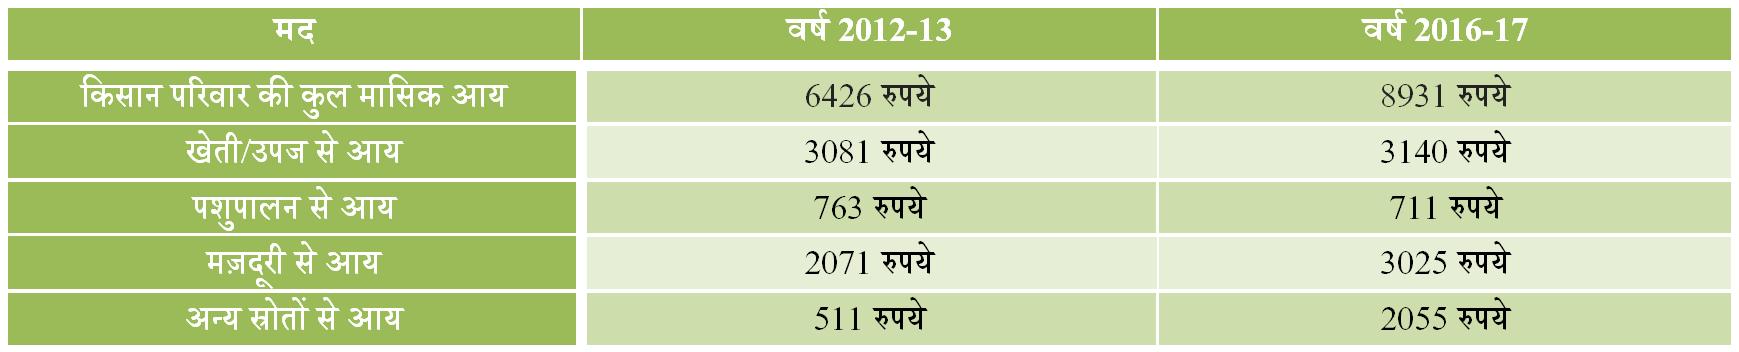 Farmers Index